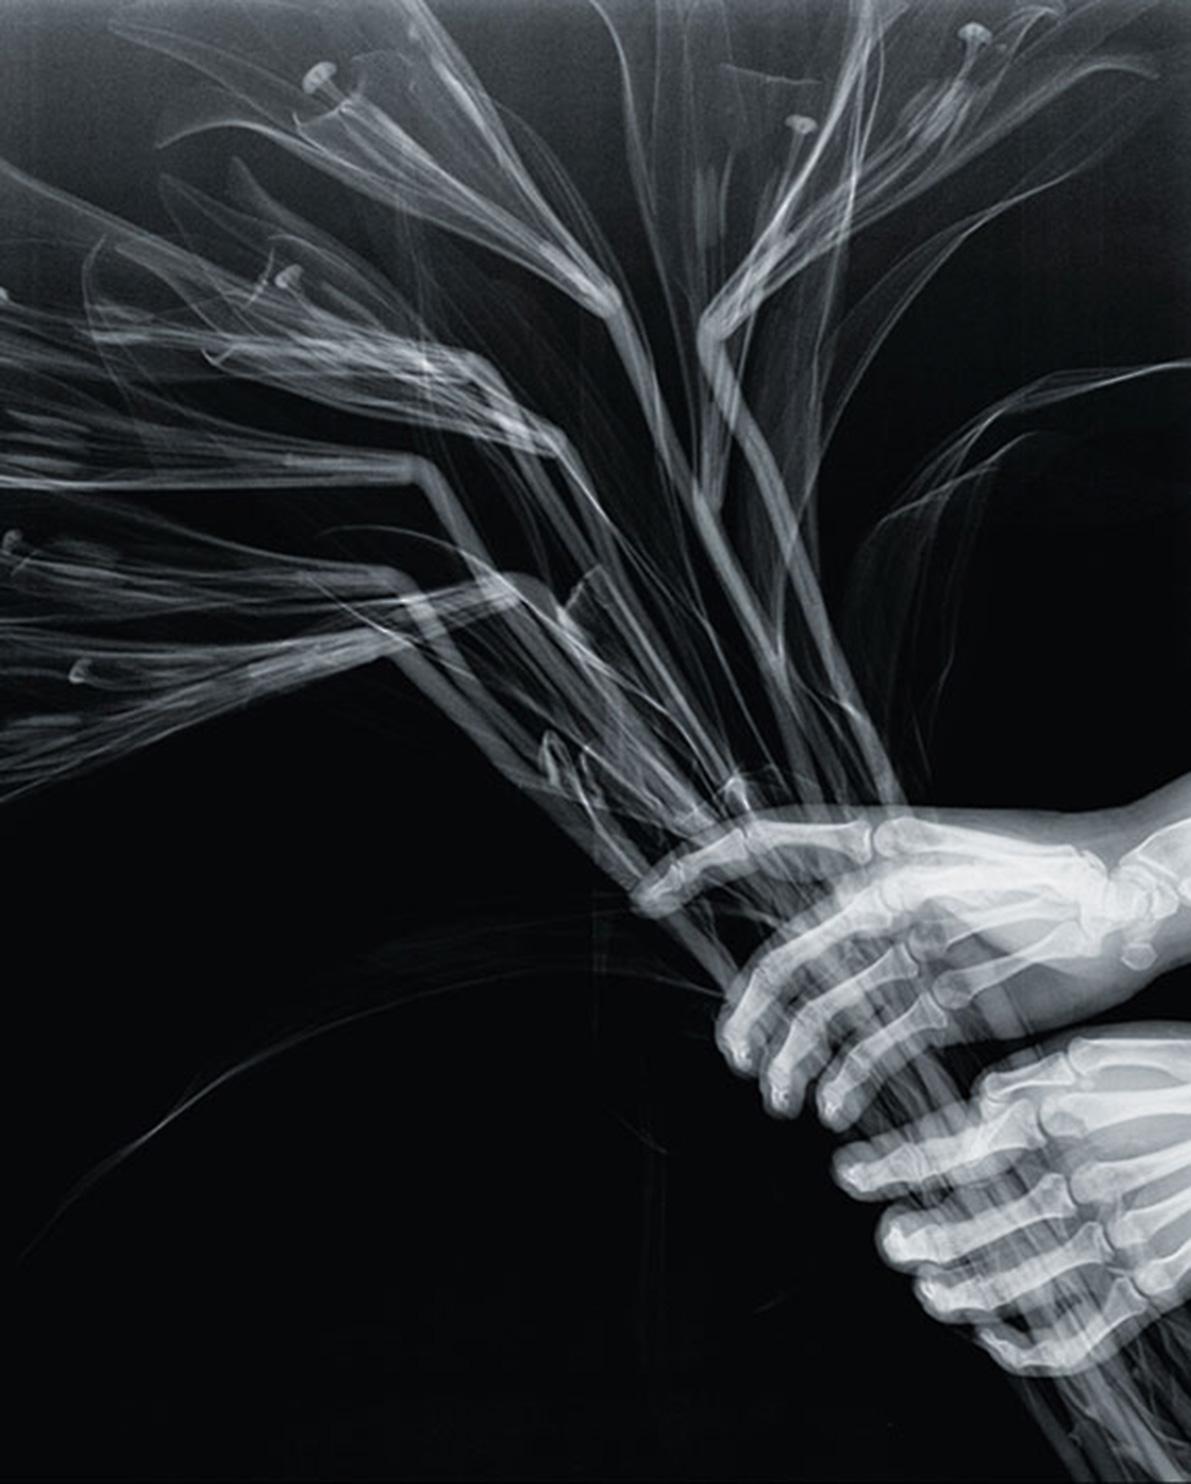 Grotesque & Arabesque (Hands with Lilies), lambda duratrans, x-ray, light box, 42,5 x 52,5 cm